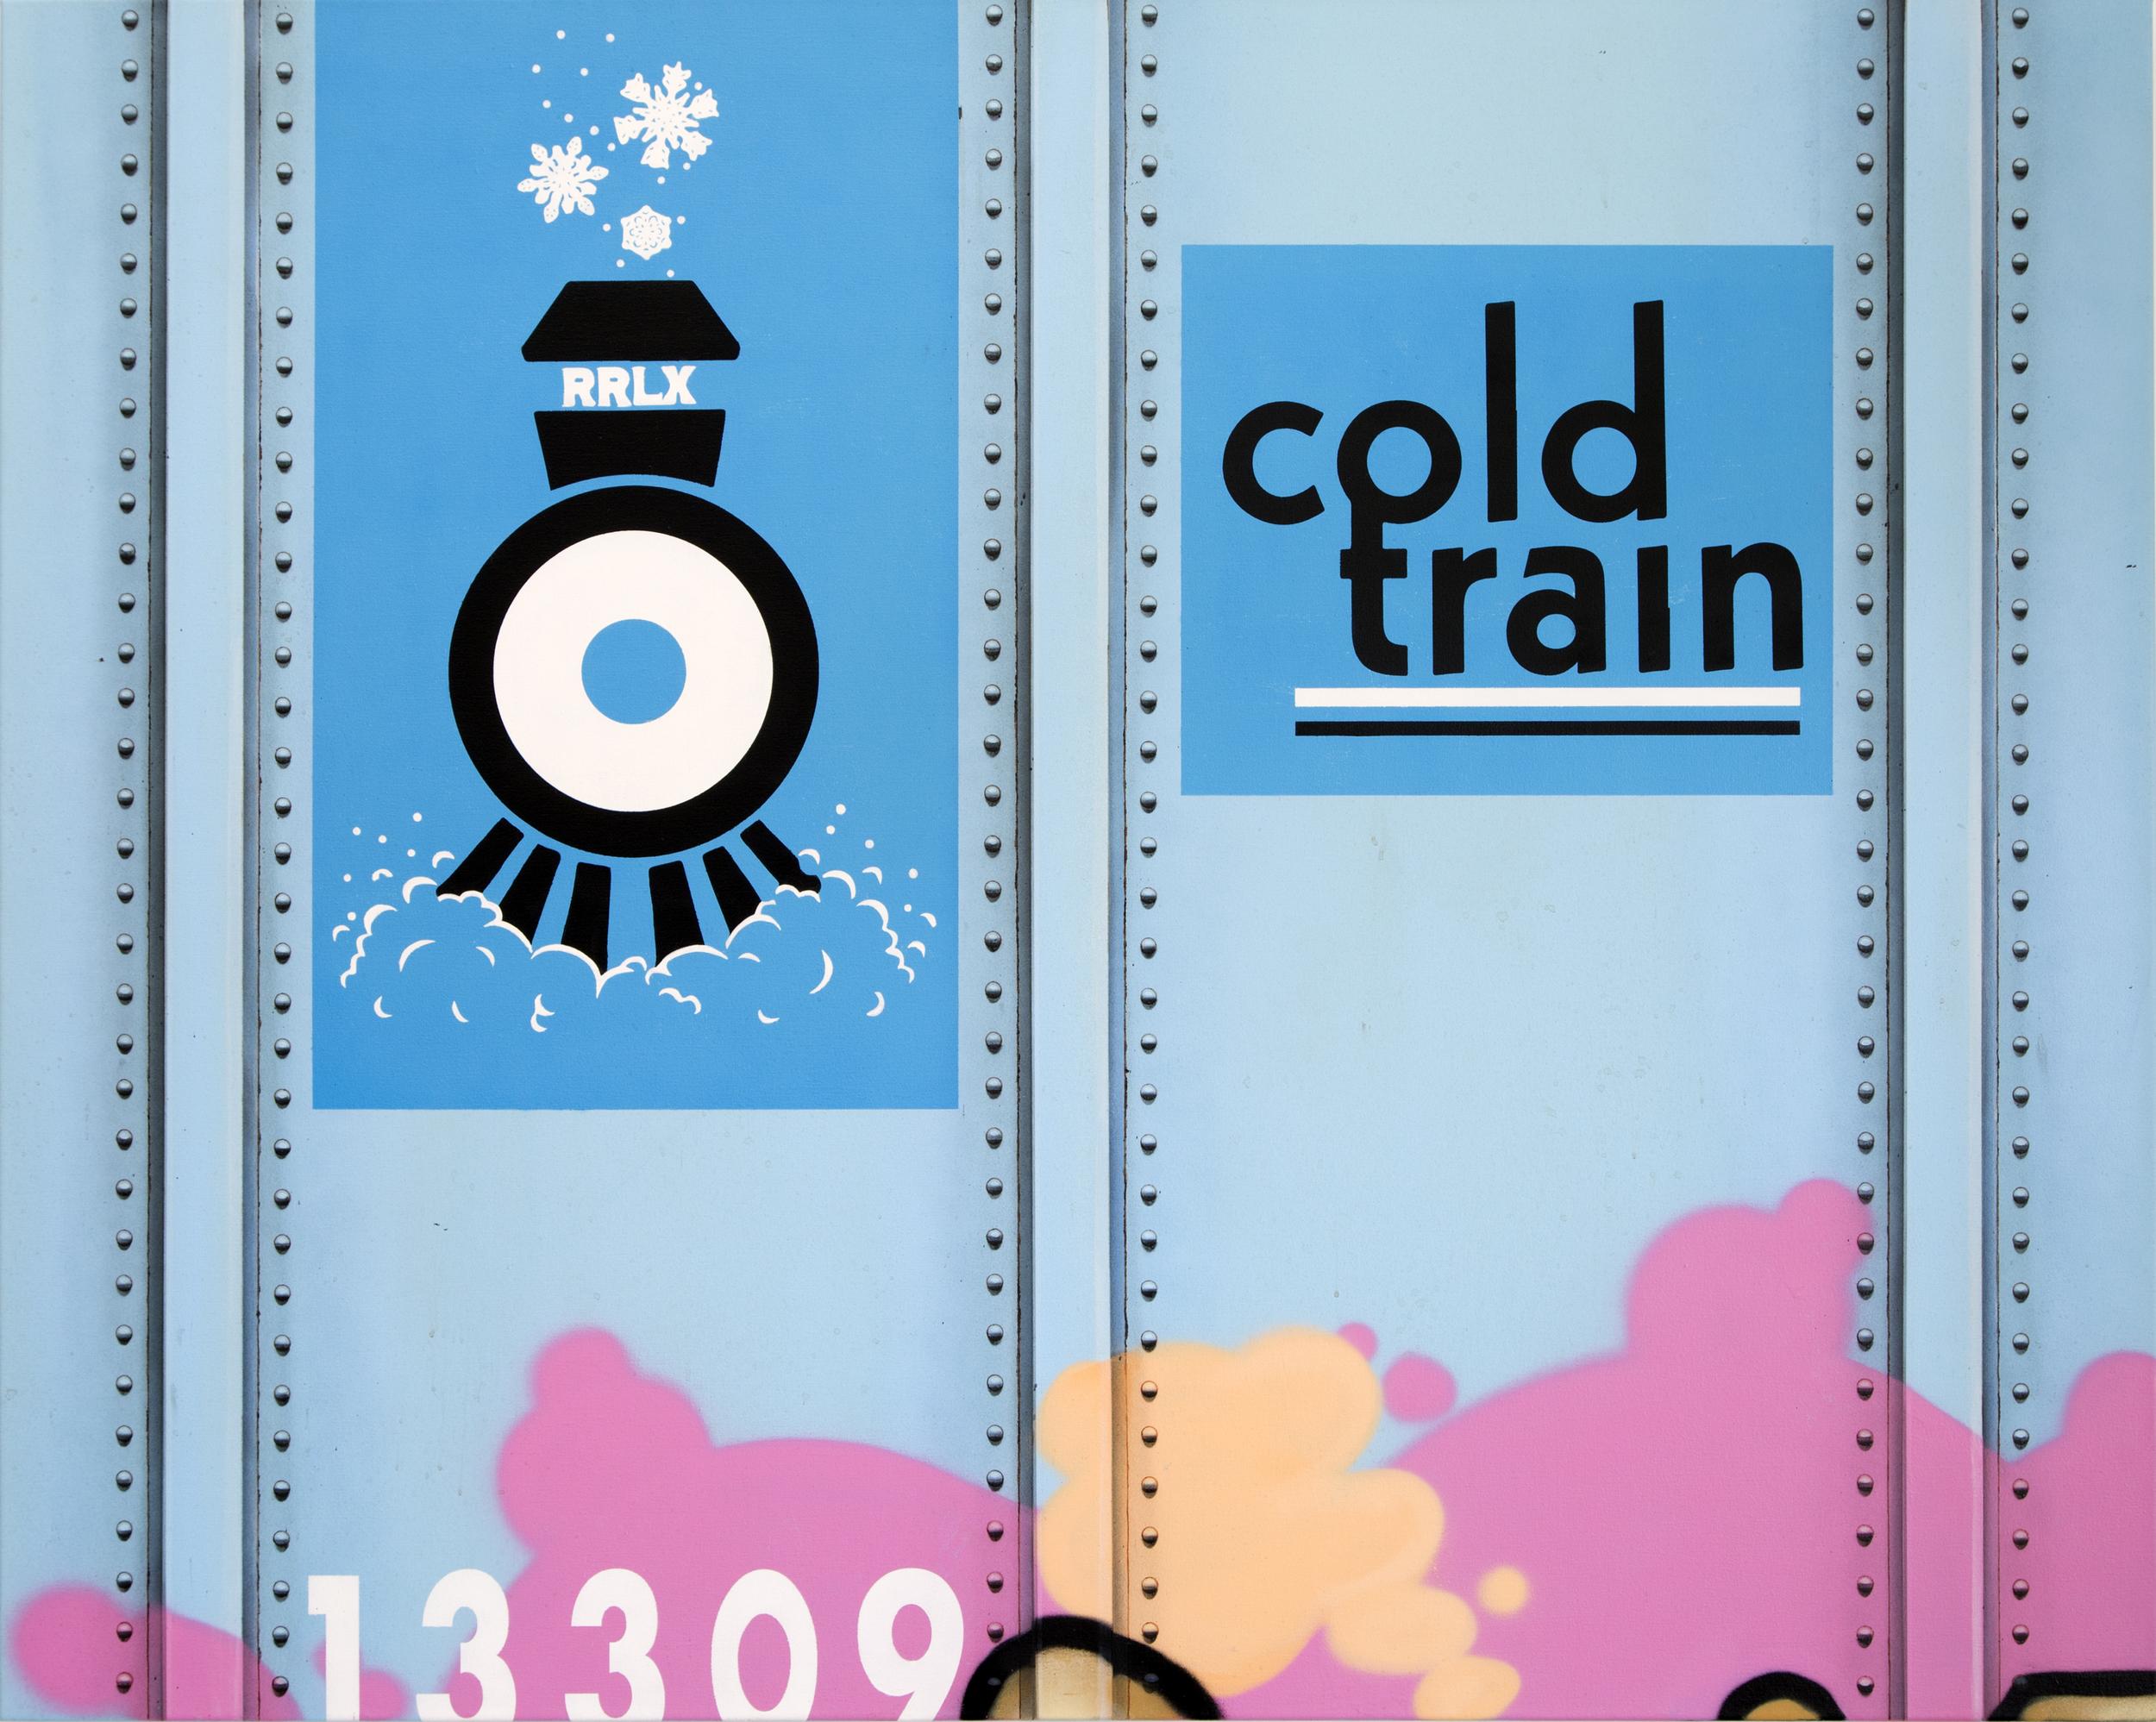 Blank Canvas #43 – Cold Train, Freight Train Painting, Boxcar Painting, Railroad Art, Tim Conlon Art